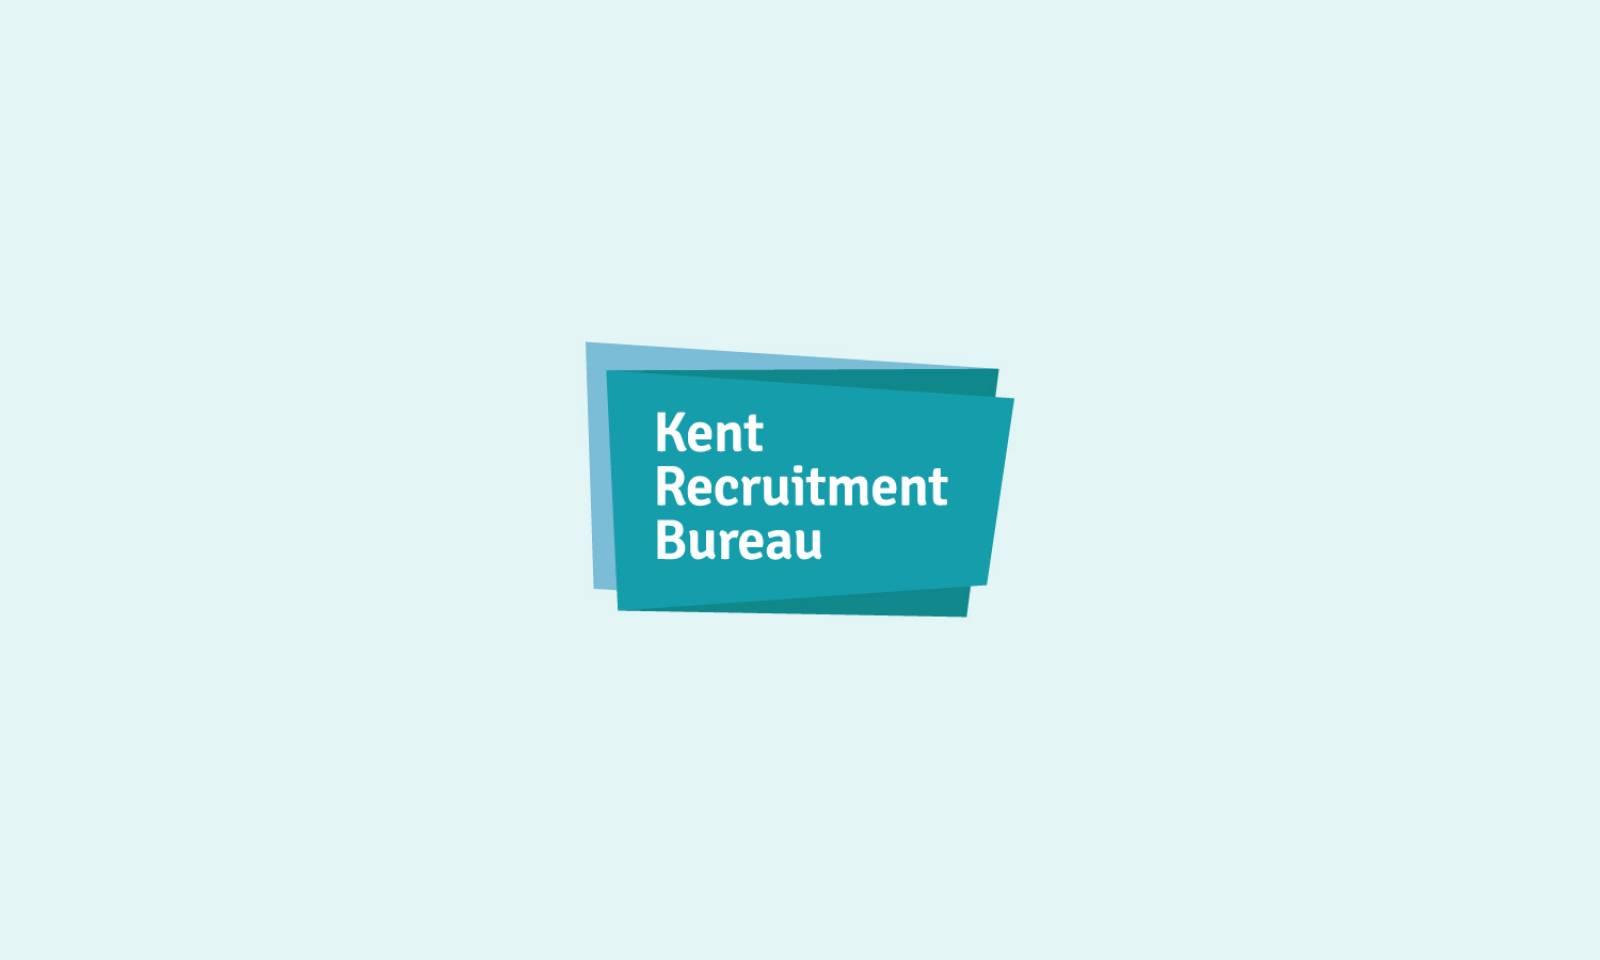 logo-KRB-corporate-identity-agency-graphic-design-canterbury.jpg